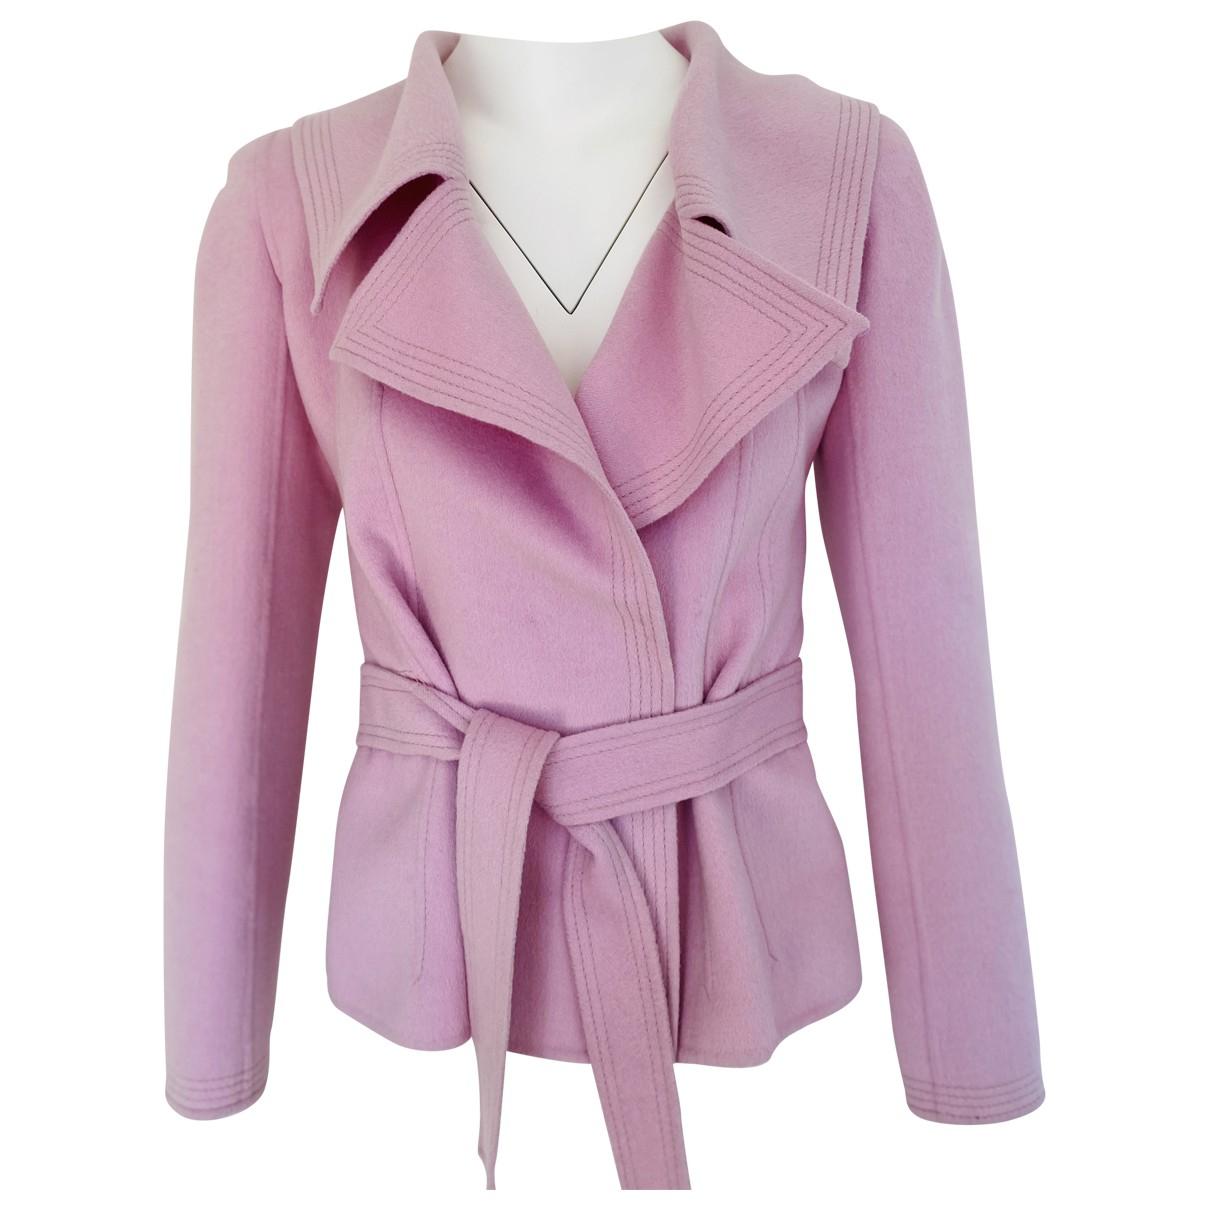 Valentino Garavani \N Pink Wool jacket for Women 6 US